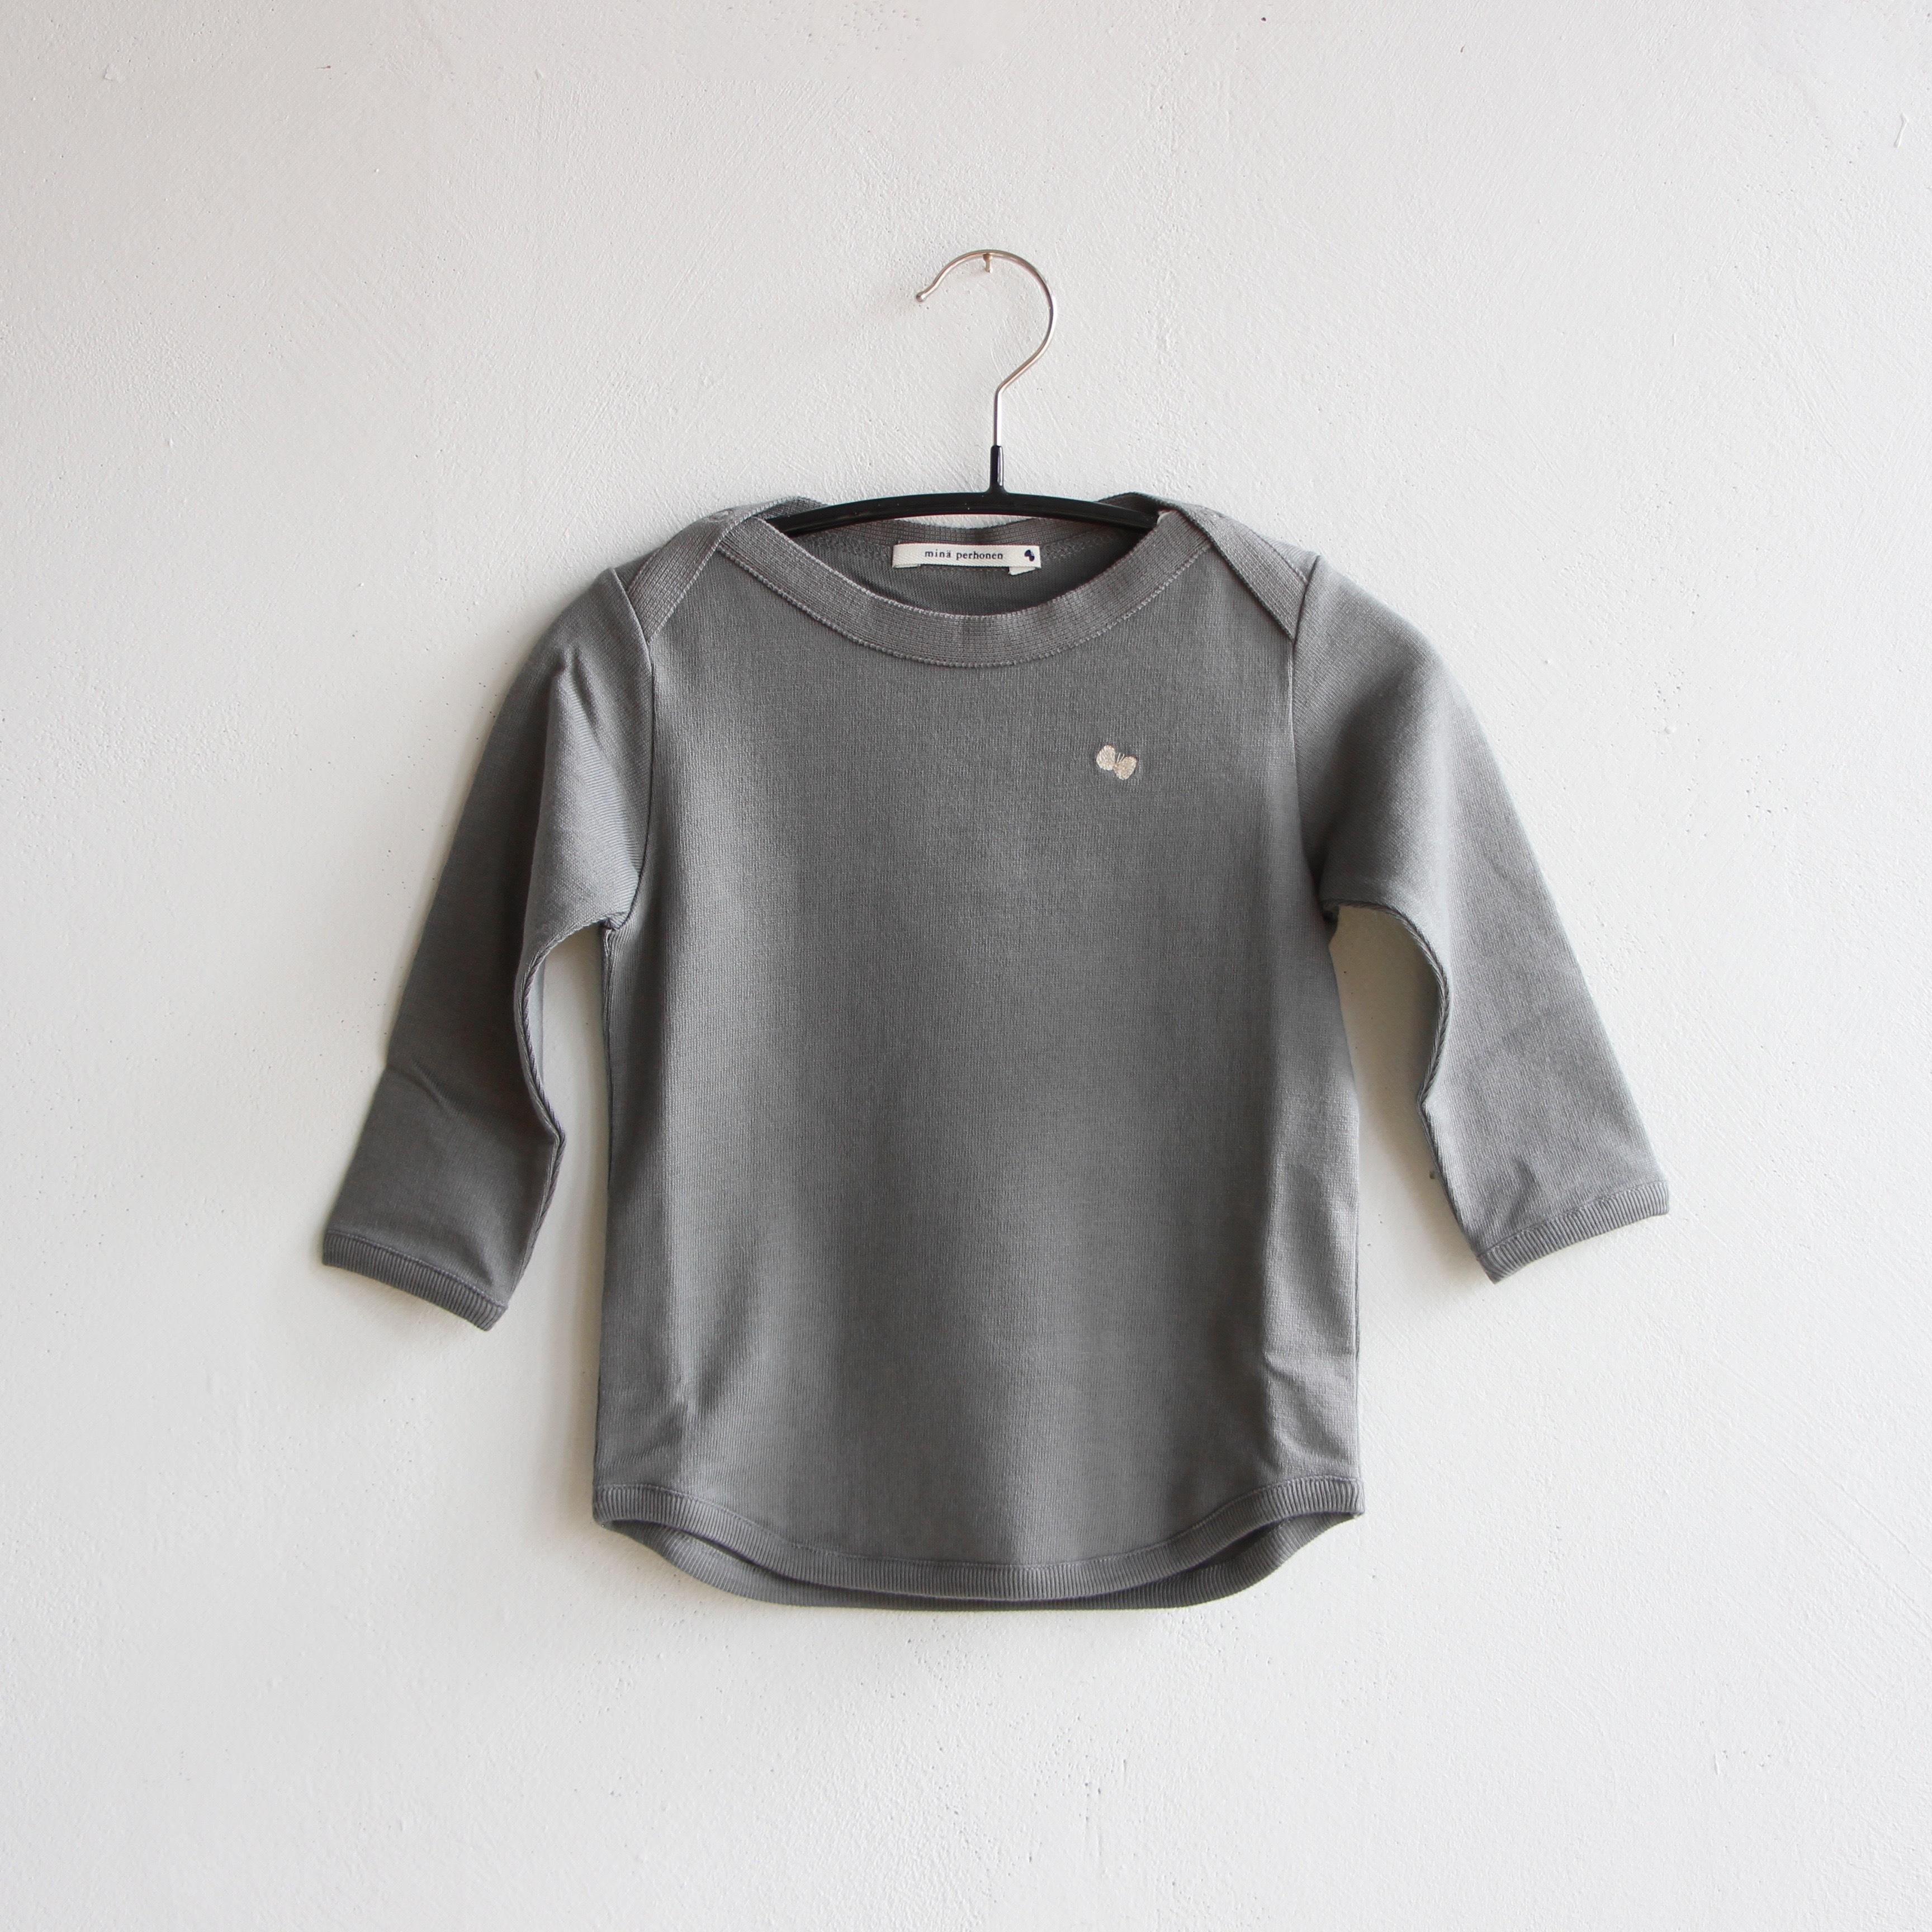 《mina perhonen 2020AW》zutto 長袖カットソー / gray / 80-100cm